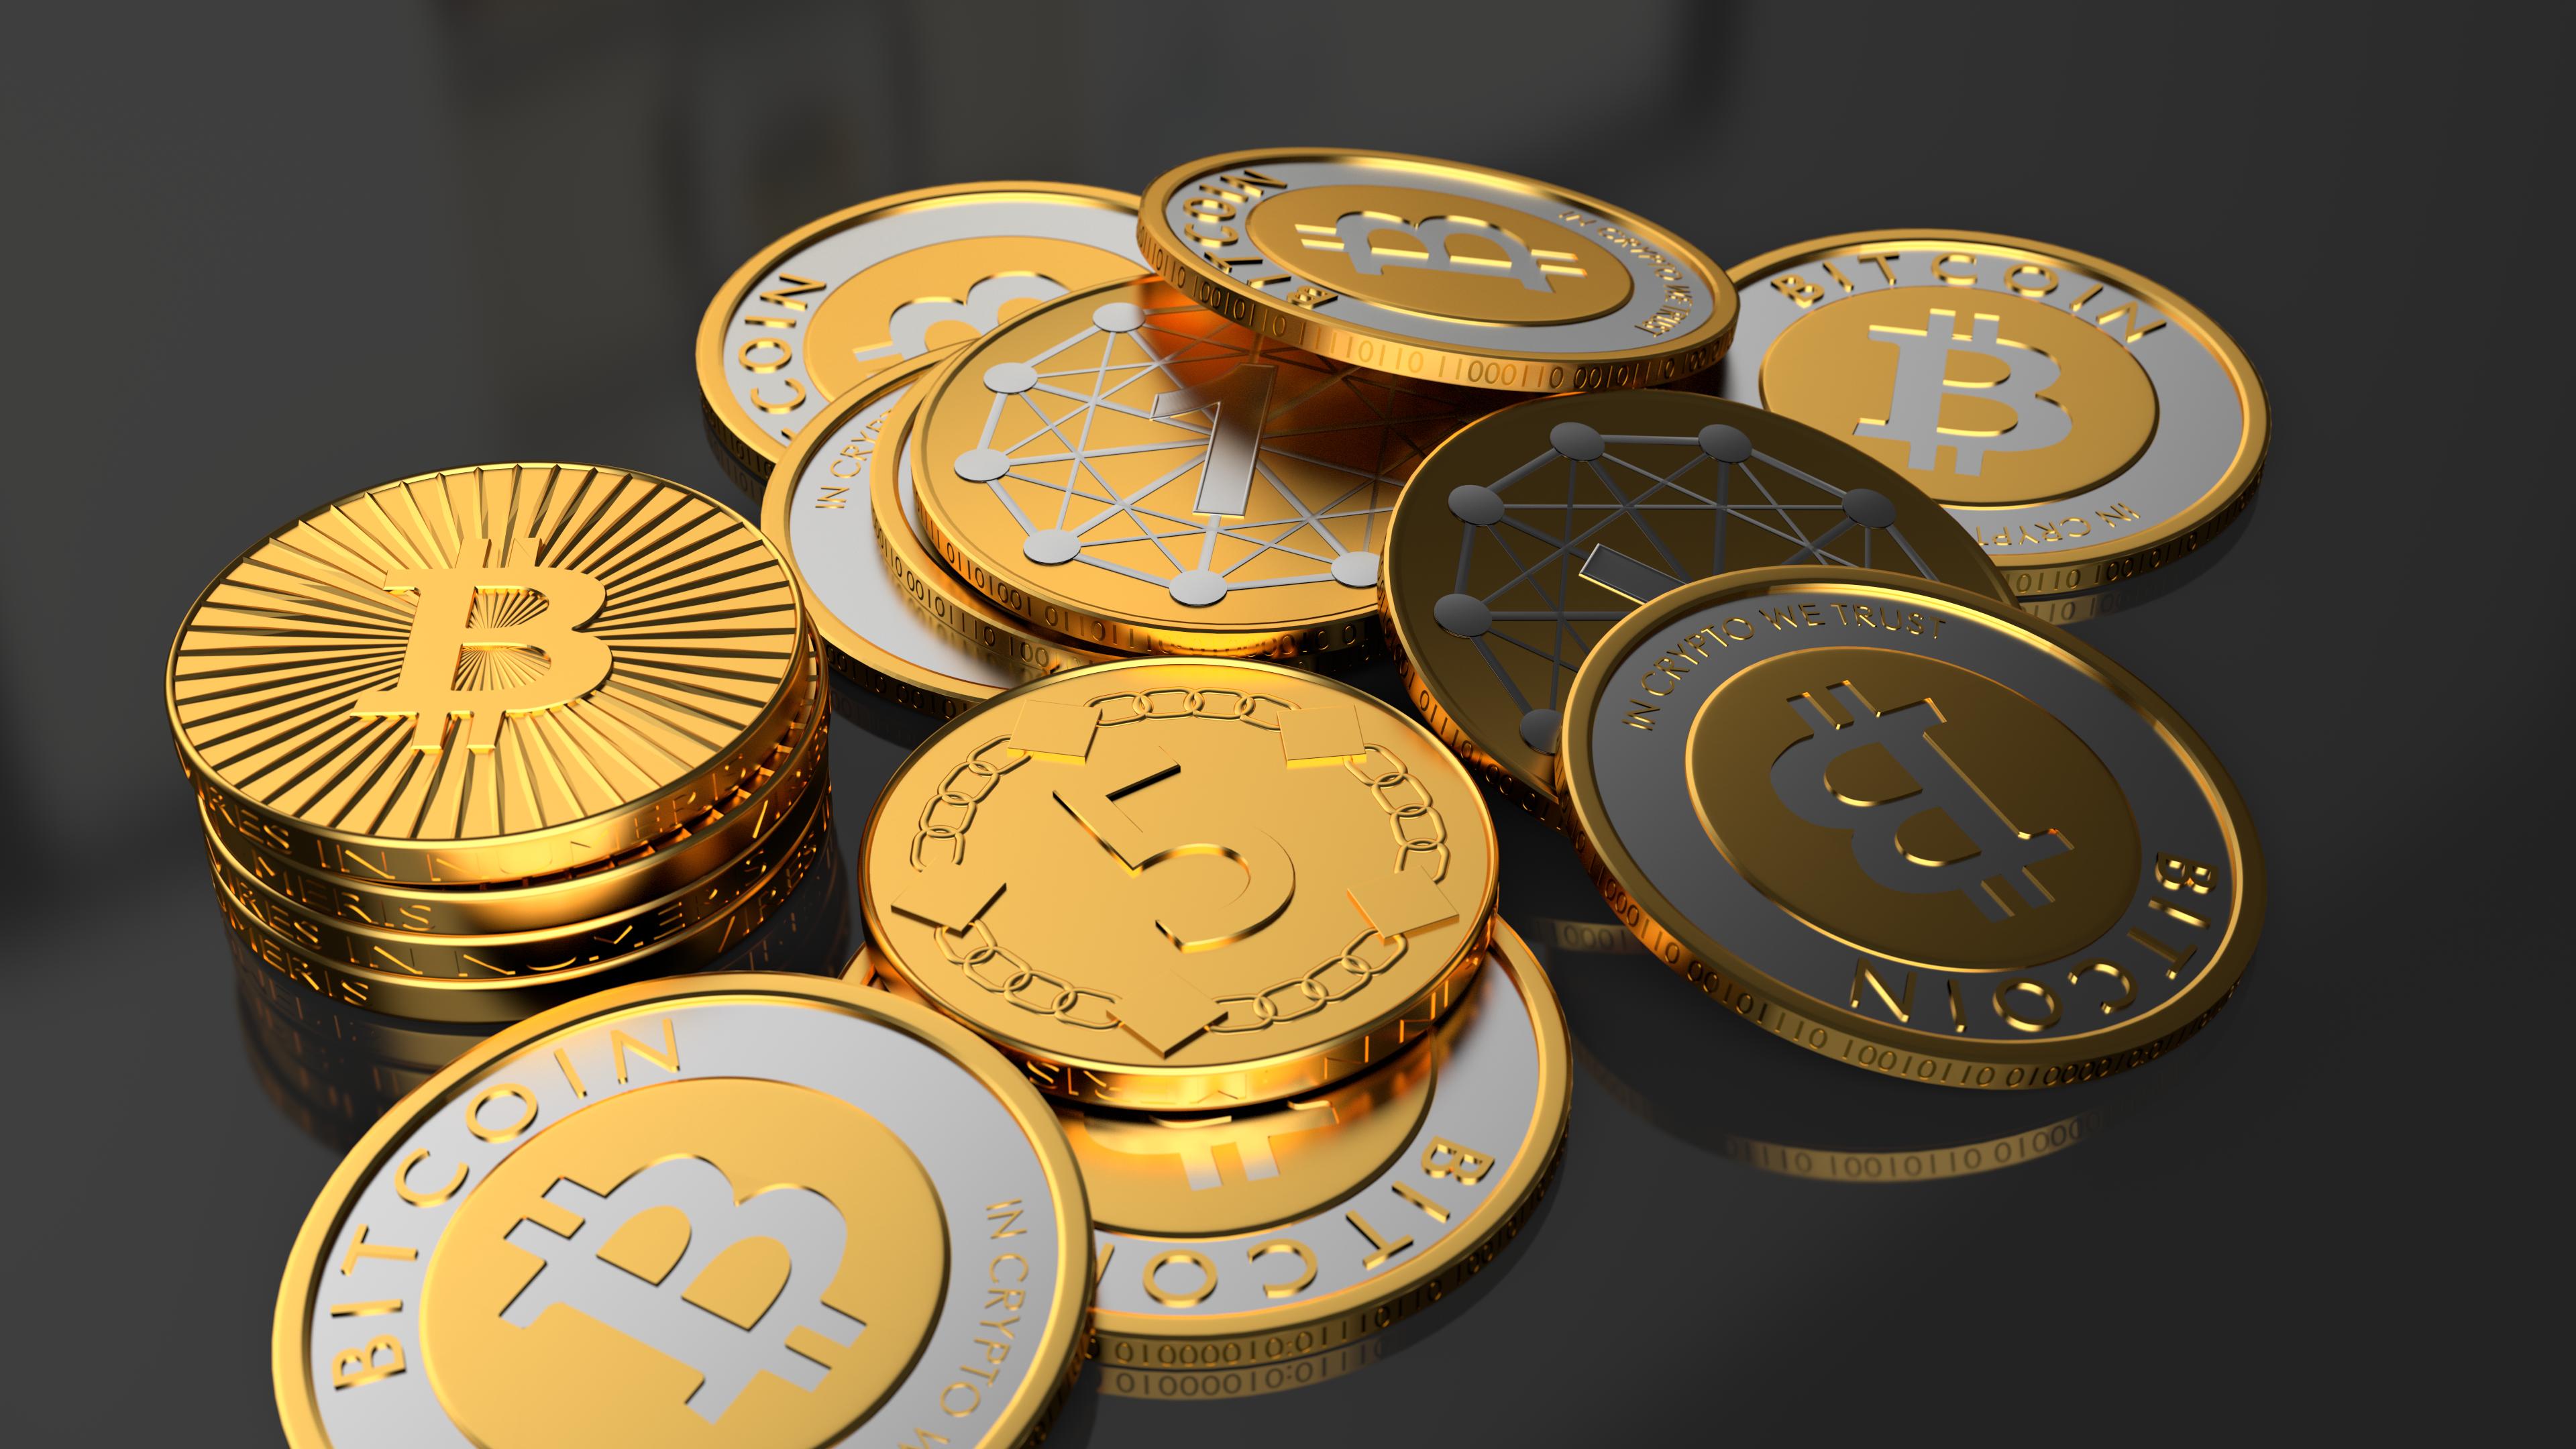 Free cryptocurrencies claim bitcoin cash